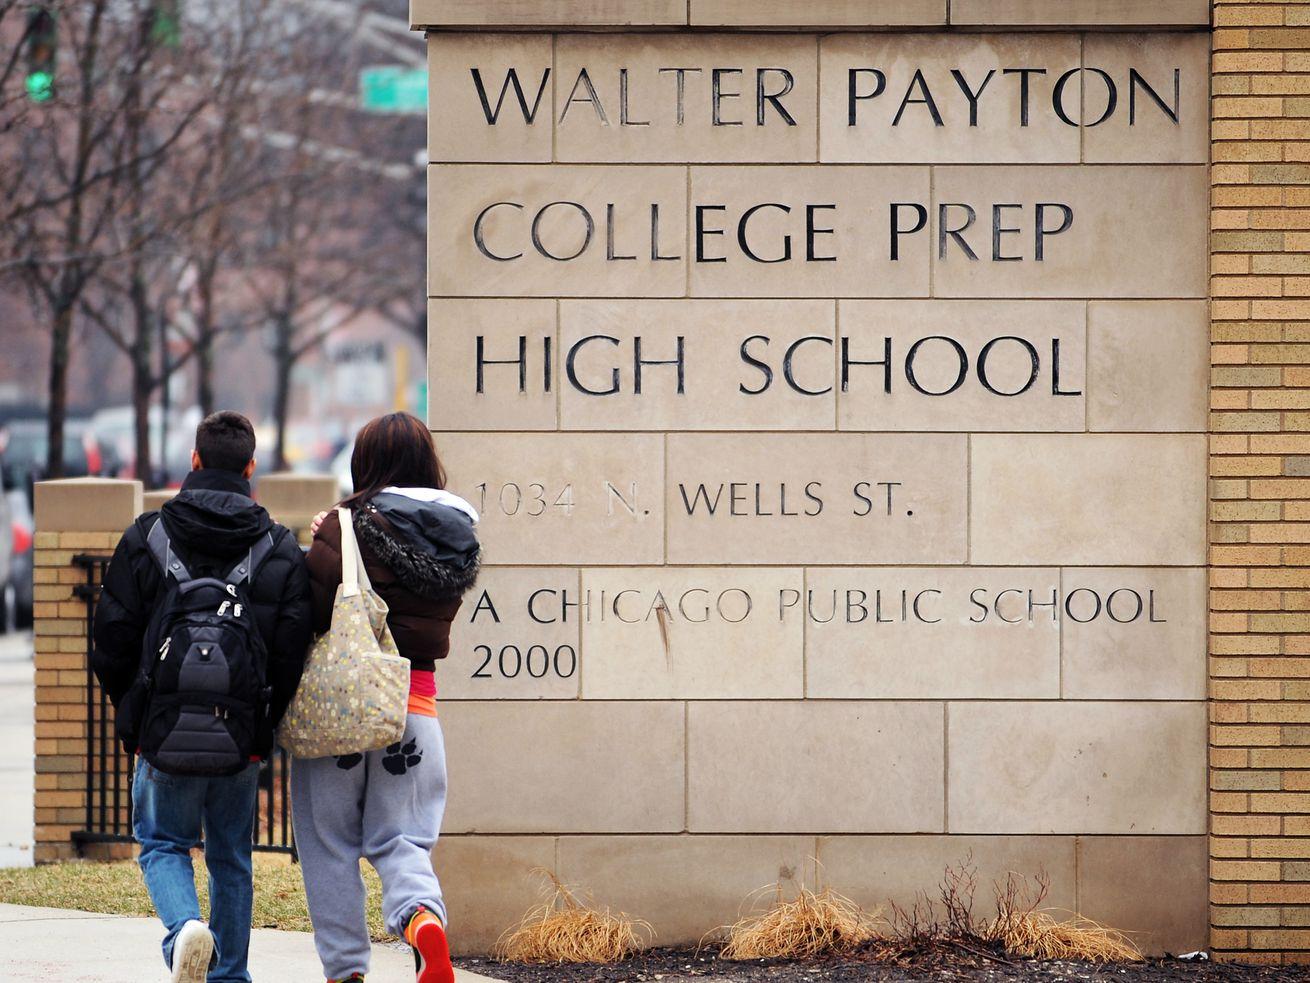 Walter Payton College Prep, 1034 N. Wells St.